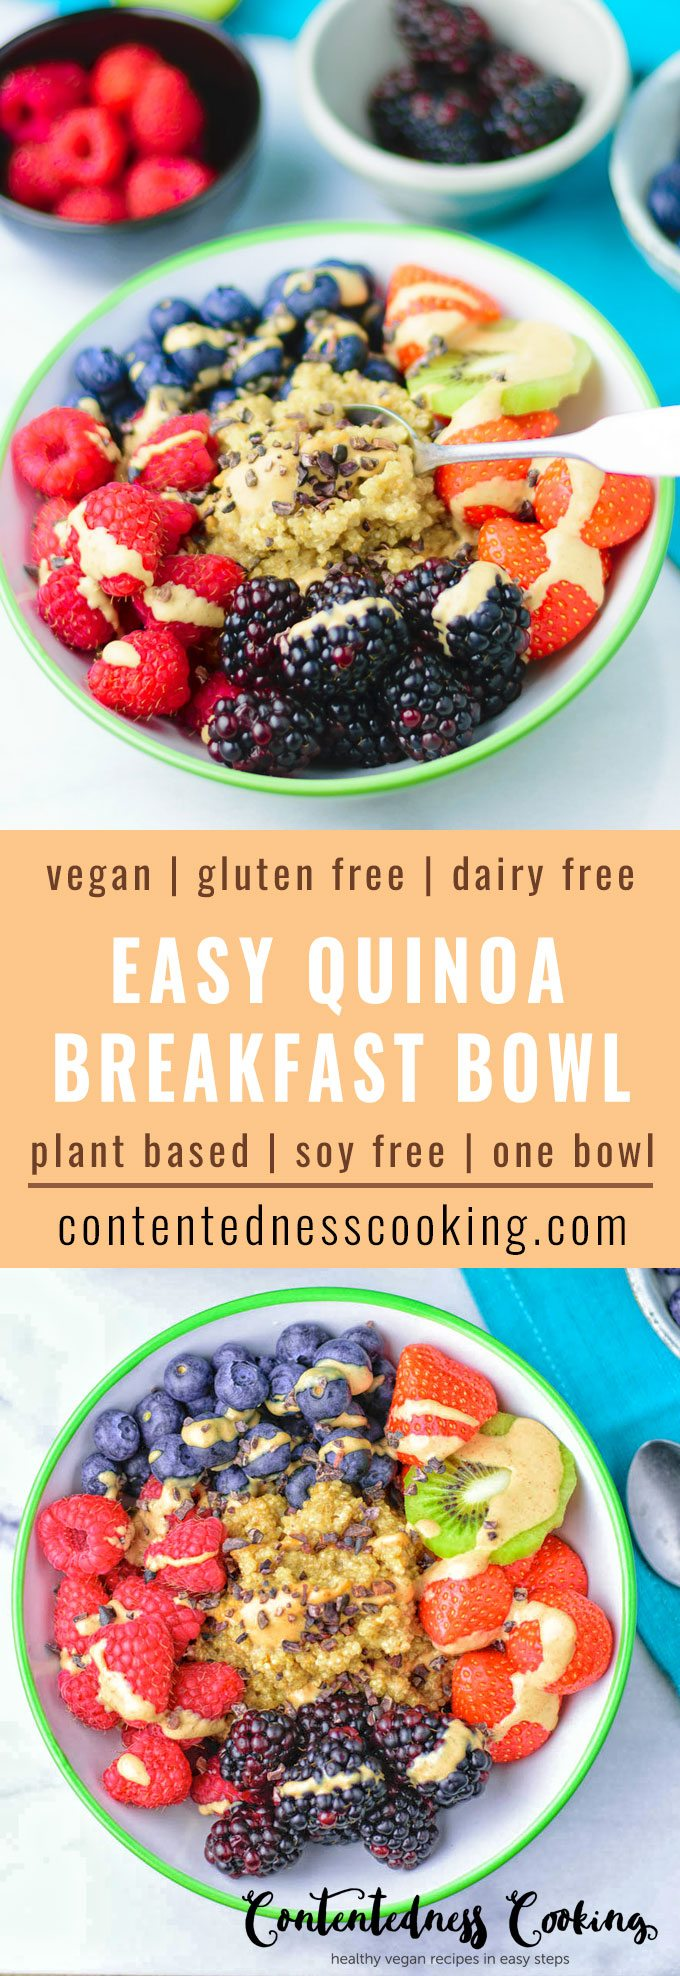 Easy Everyday Quinoa Breakfast Bowl | #vegan #glutenfree #plantbased #dairy free